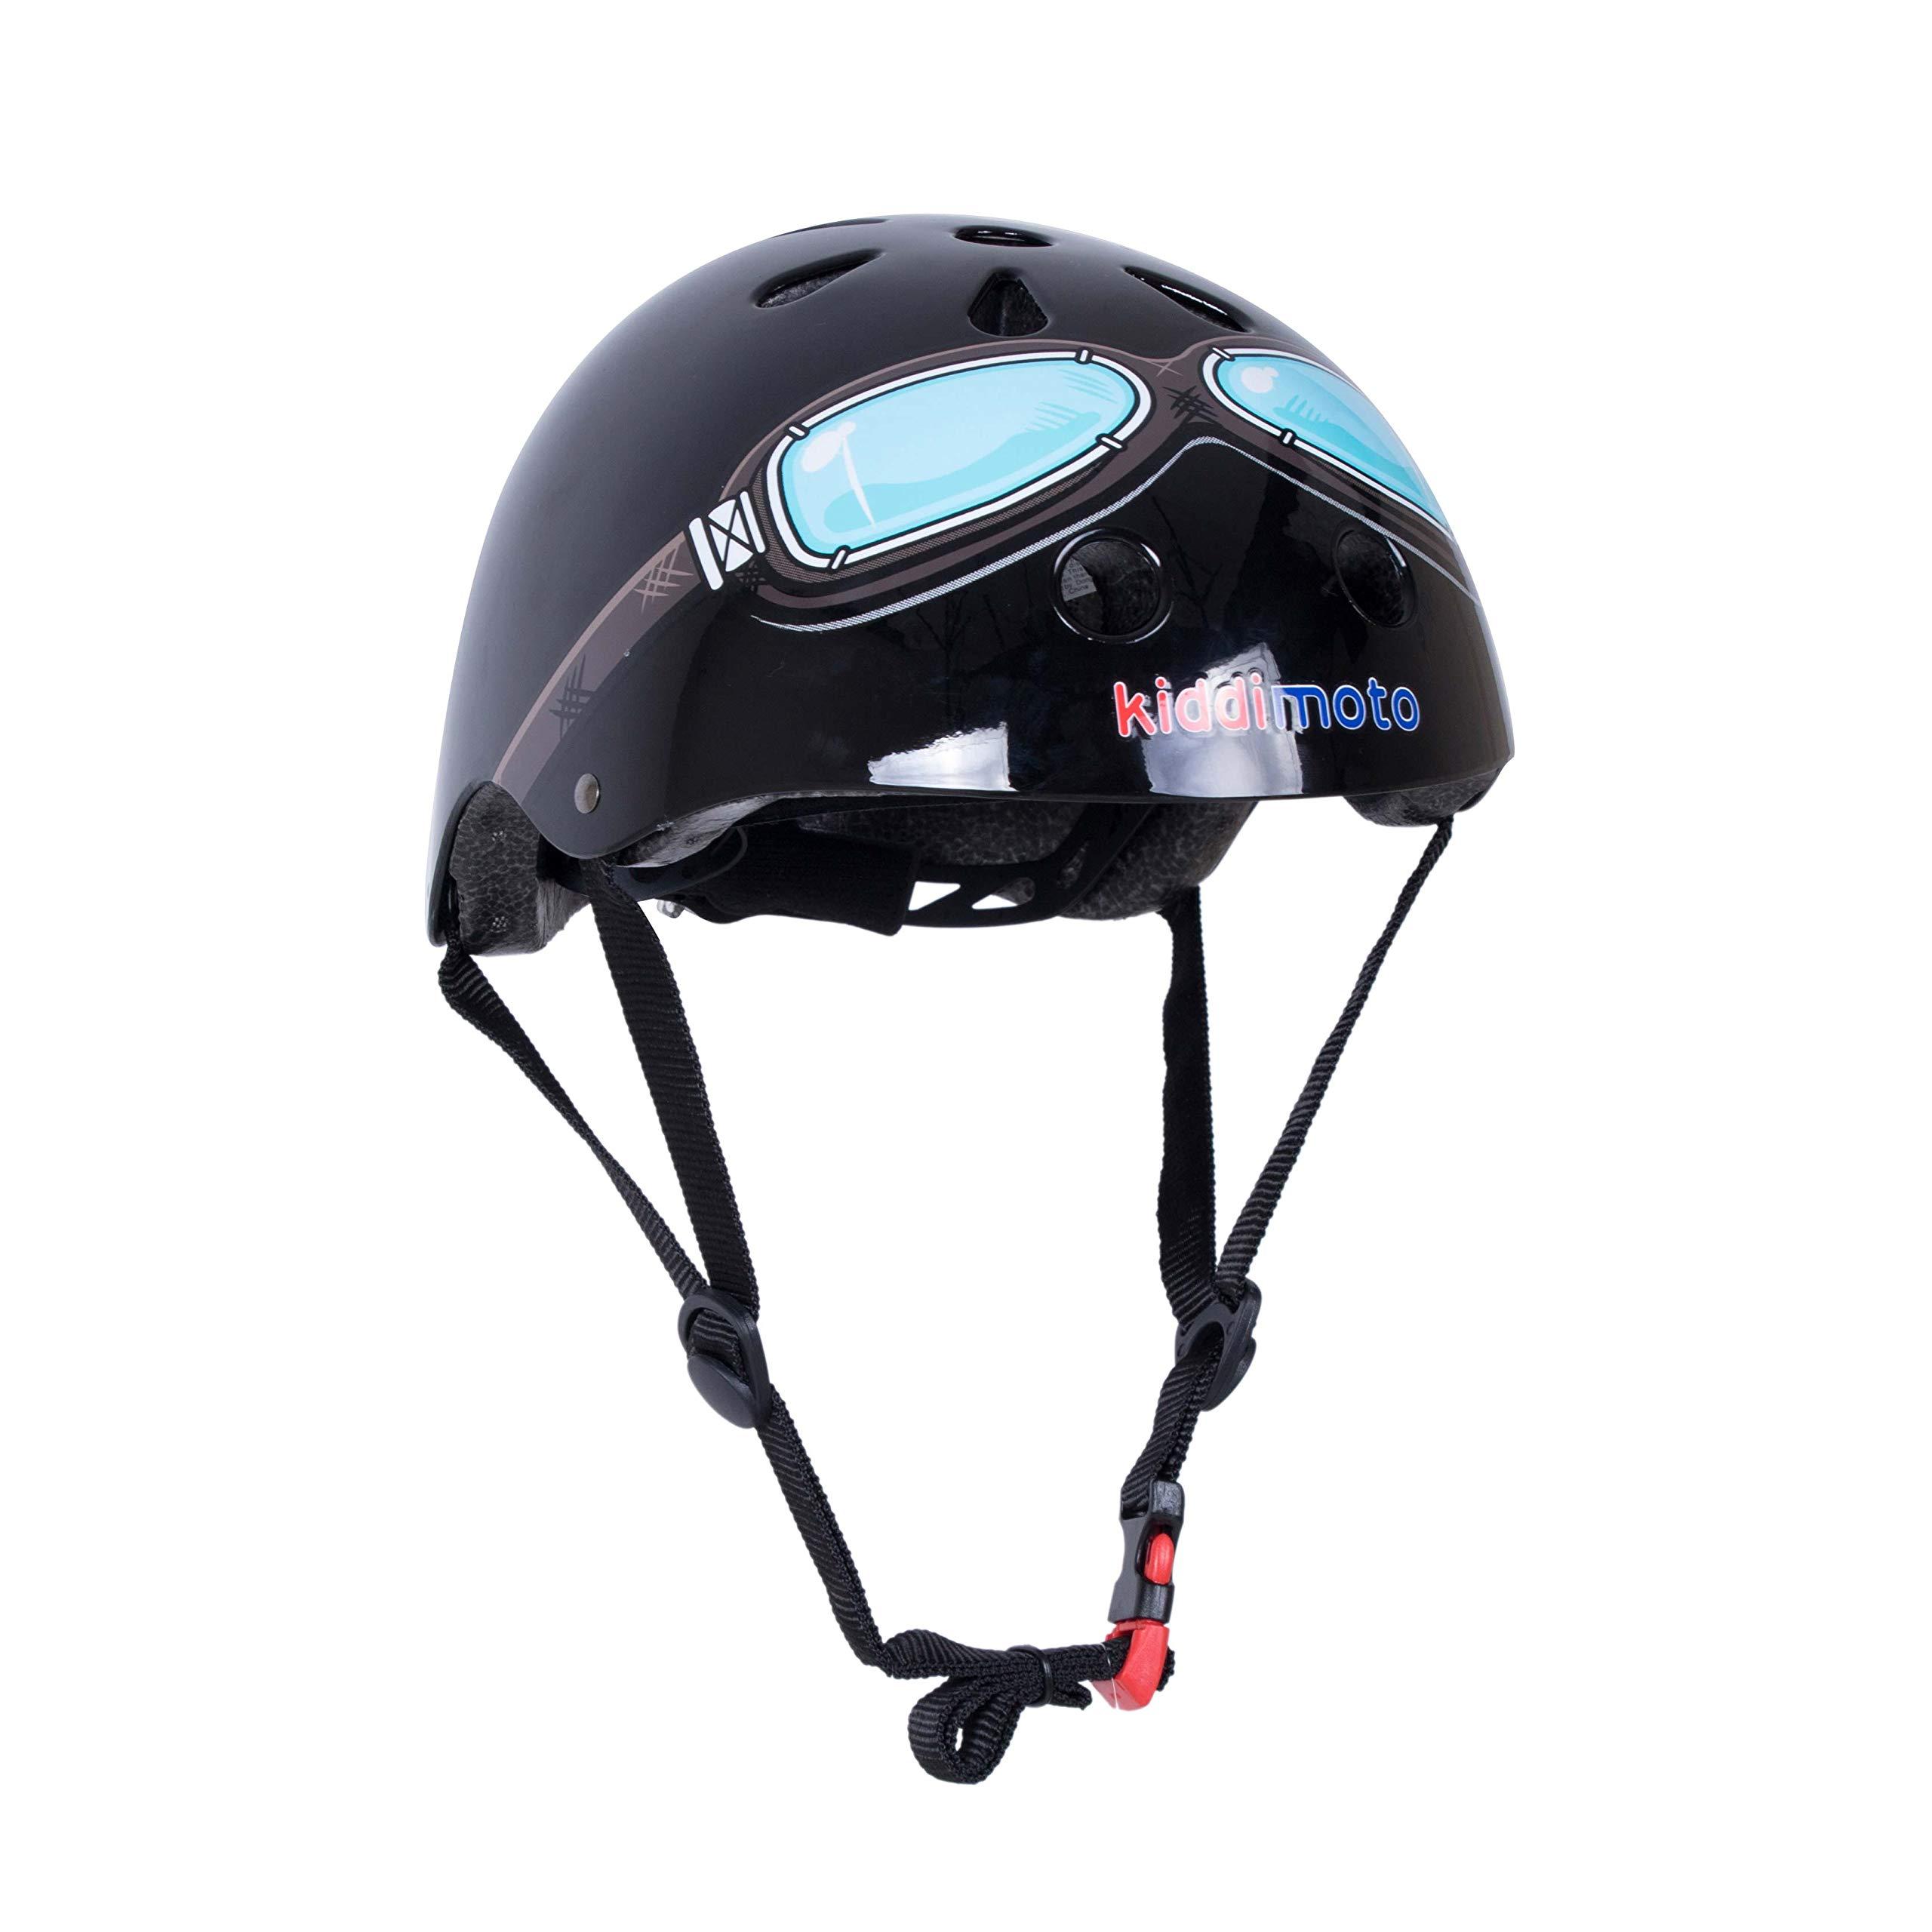 Kiddimoto Kids Patterned Helmet (Black Goggle, Small)